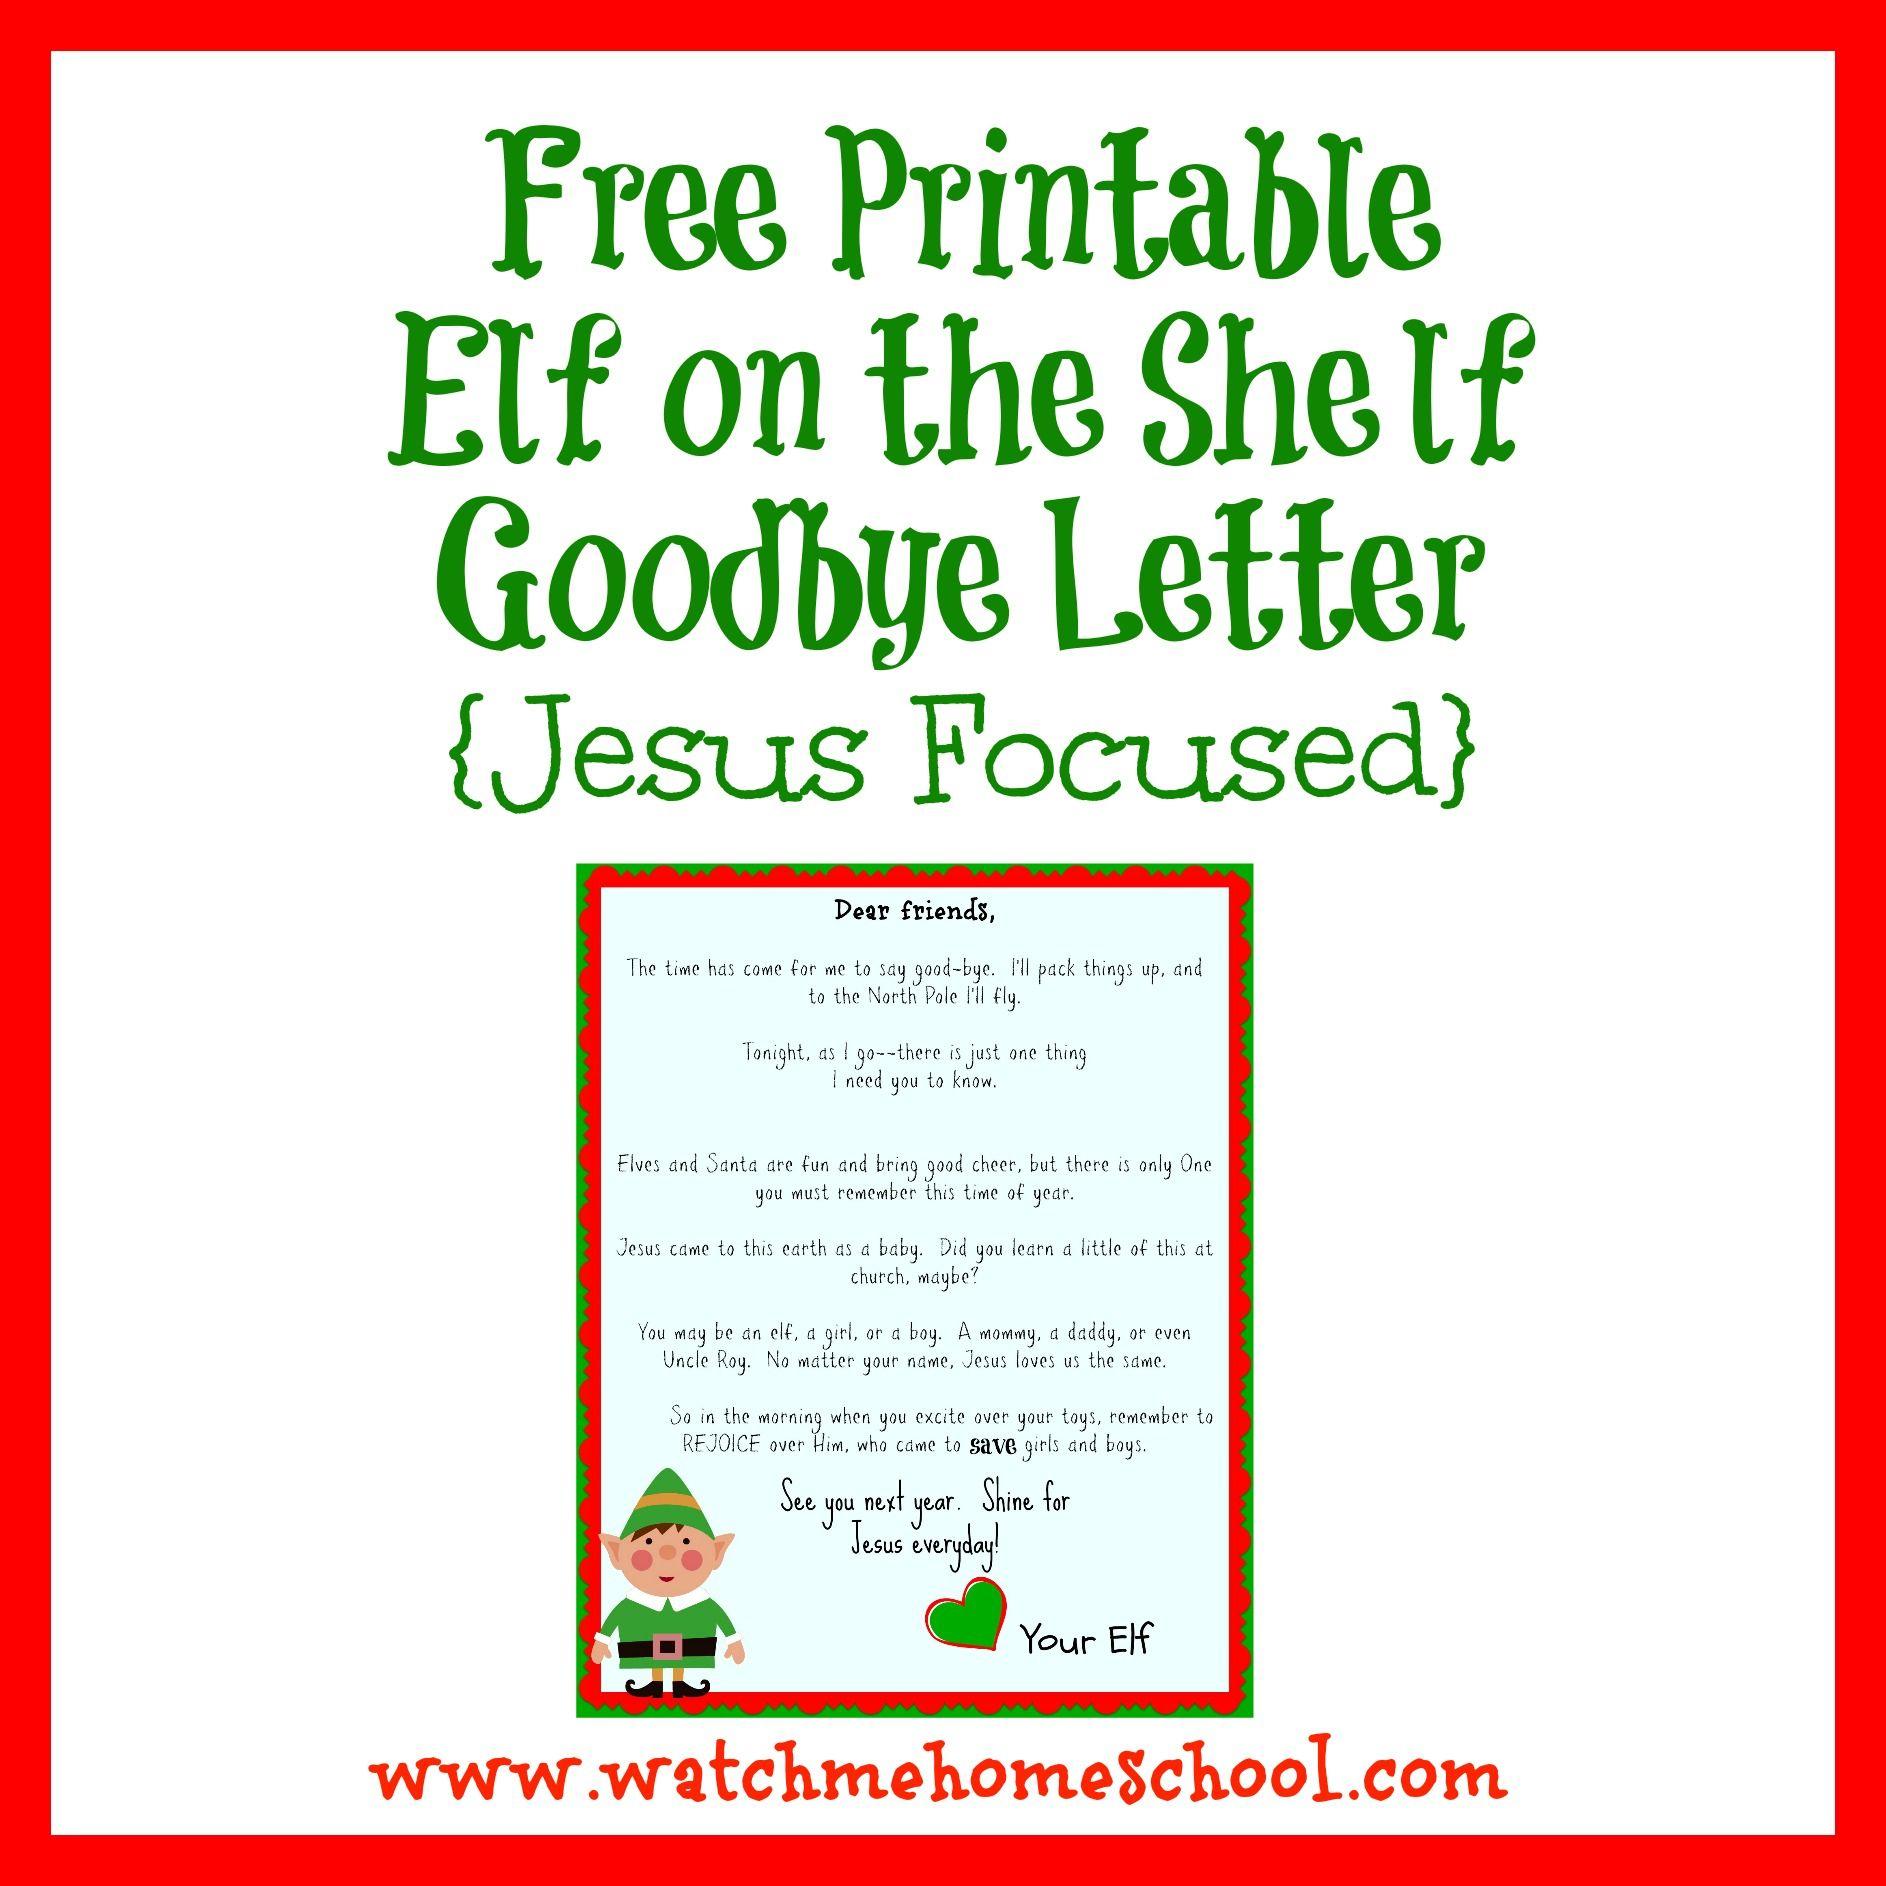 Elf On The Shelf Farewell Letter Printable   Elf On The Shelf - Elf On The Shelf Goodbye Letter Free Printable